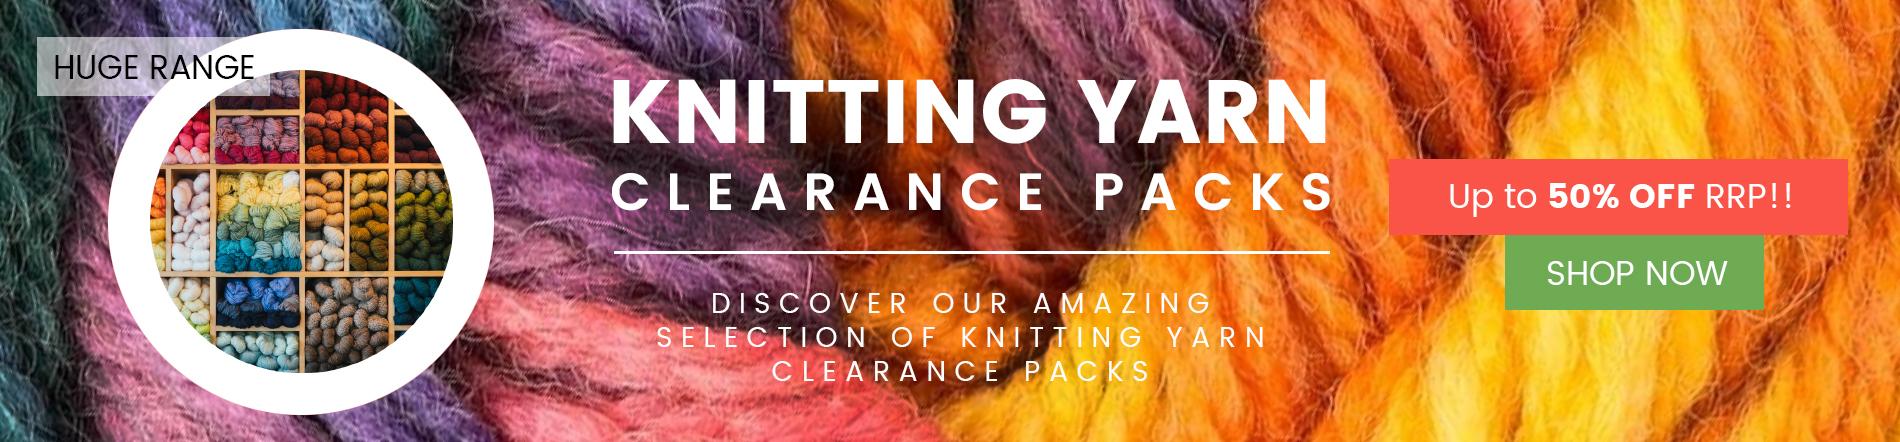 Knitting Yarn Clearance Packs